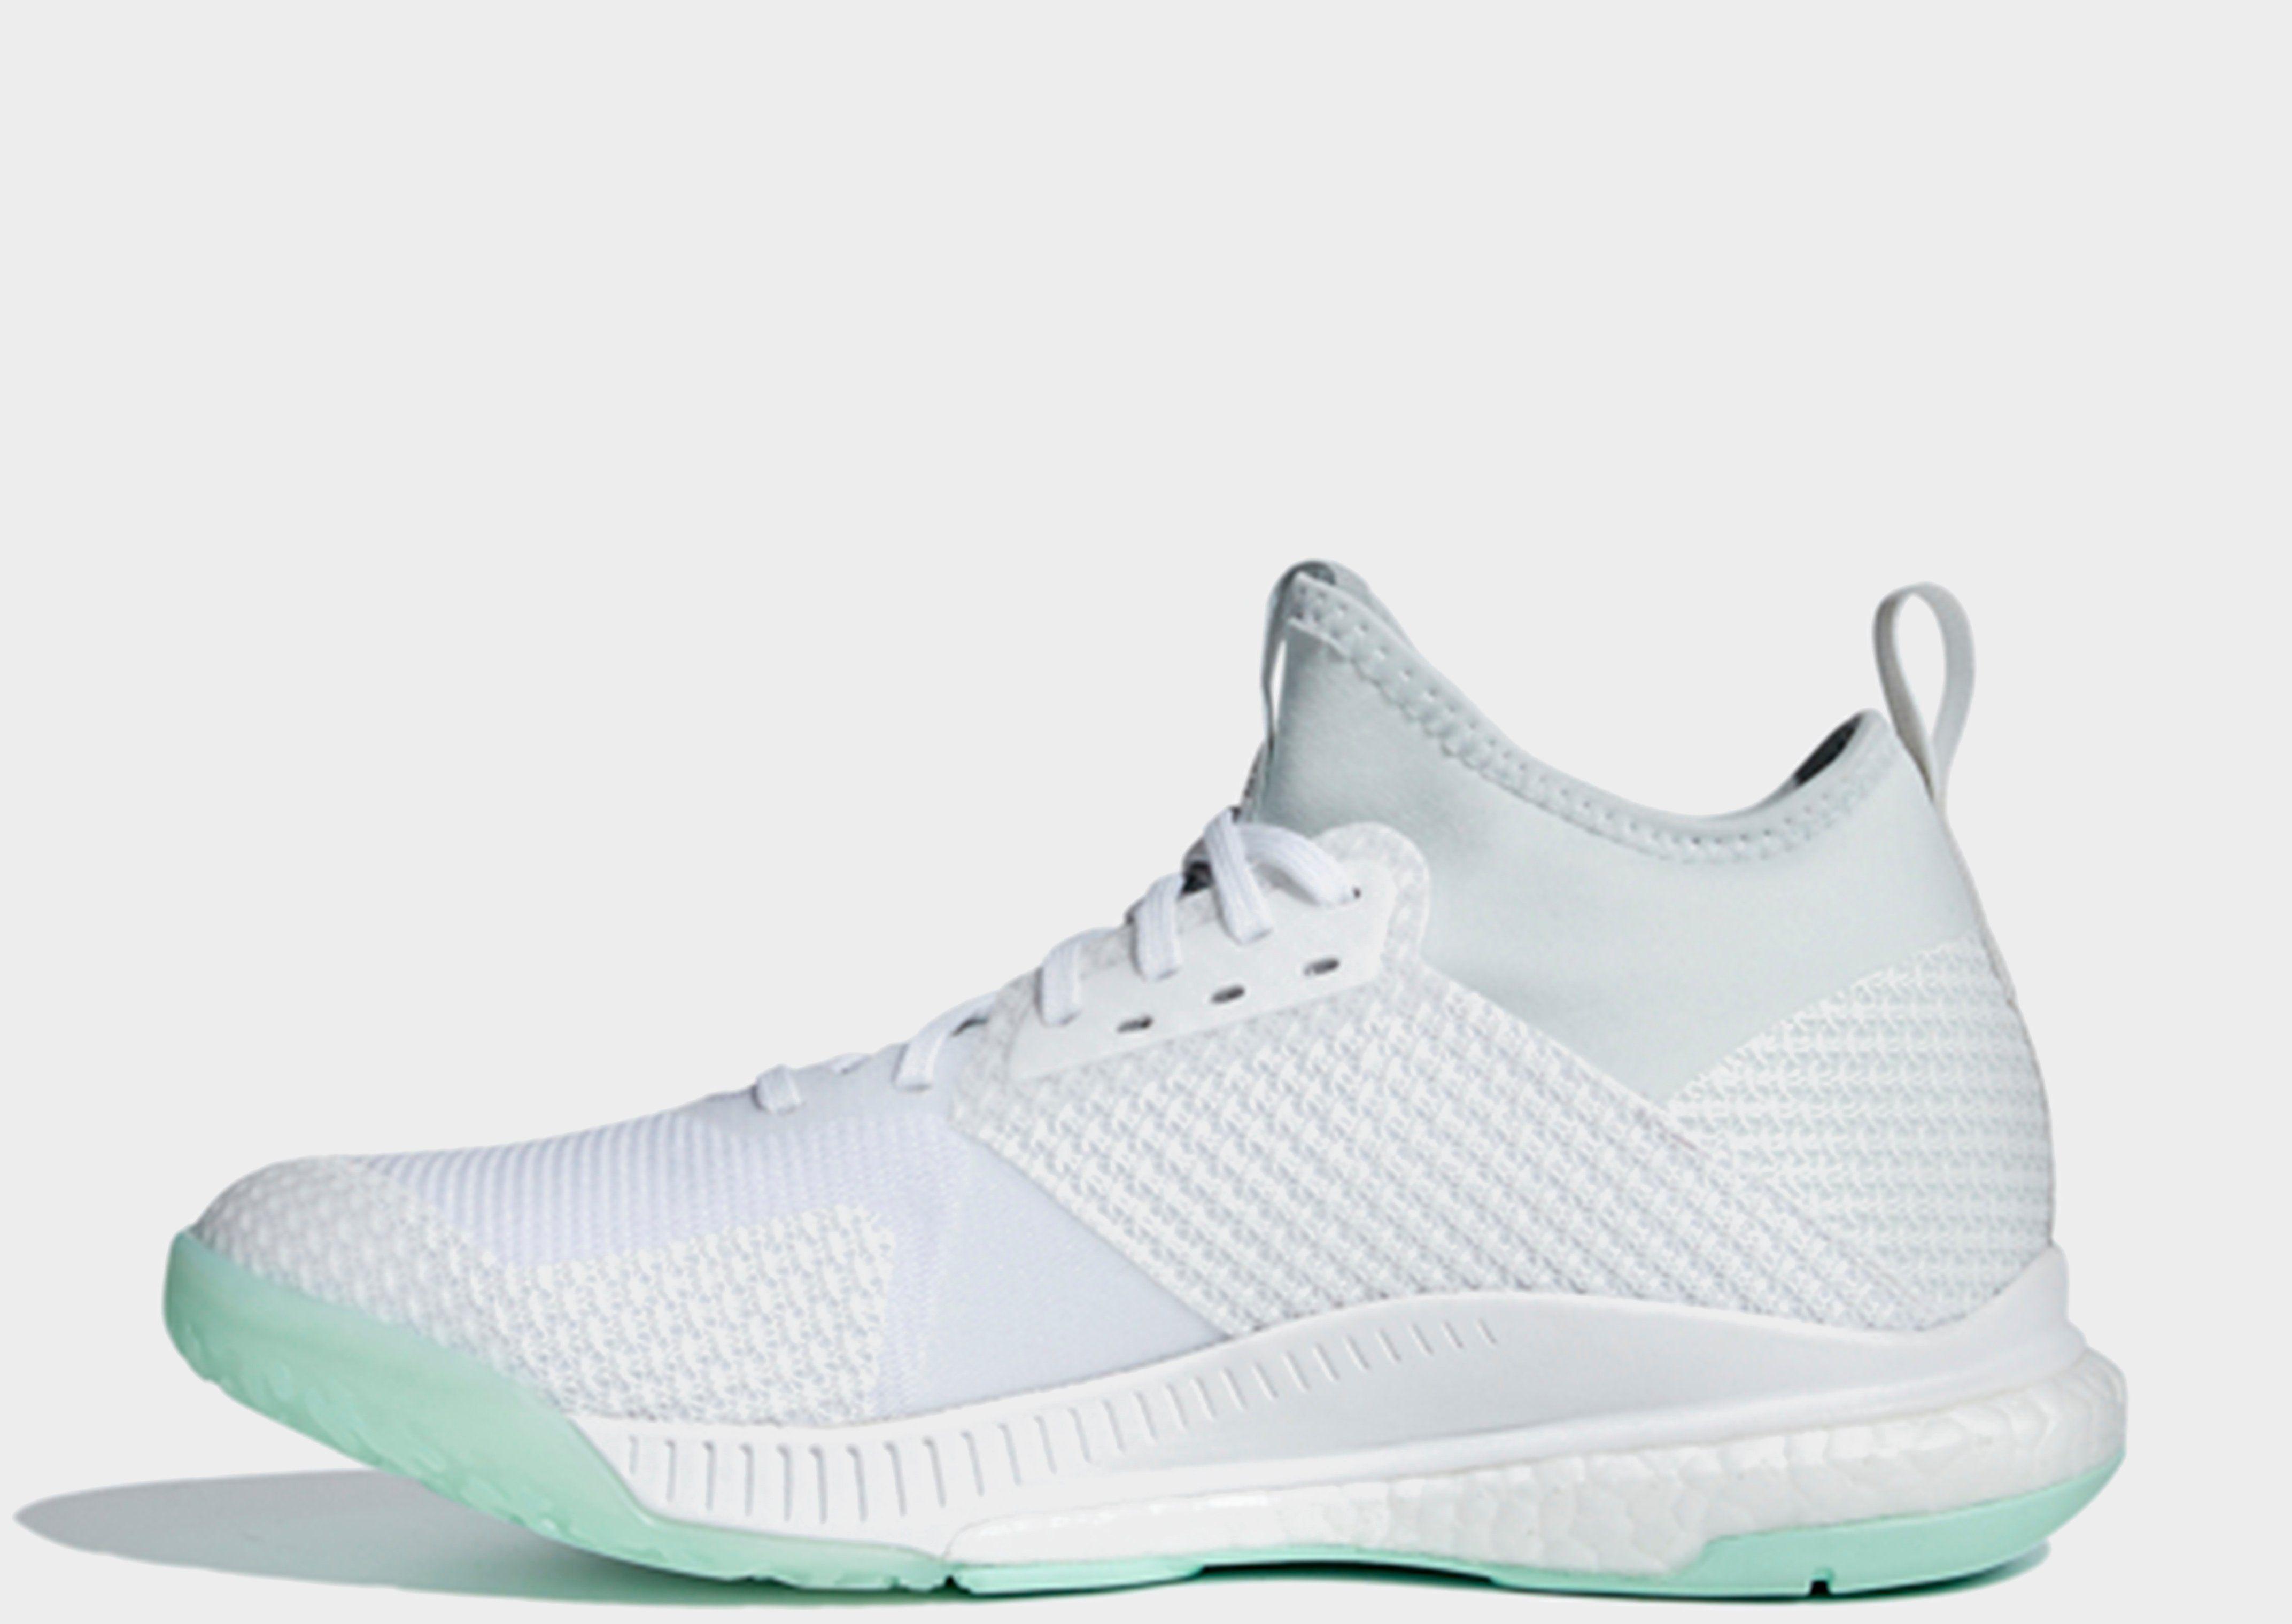 huge discount e8cd5 d49f3 ADIDAS Crazyflight X 2.0 Mid Shoes  JD Sports